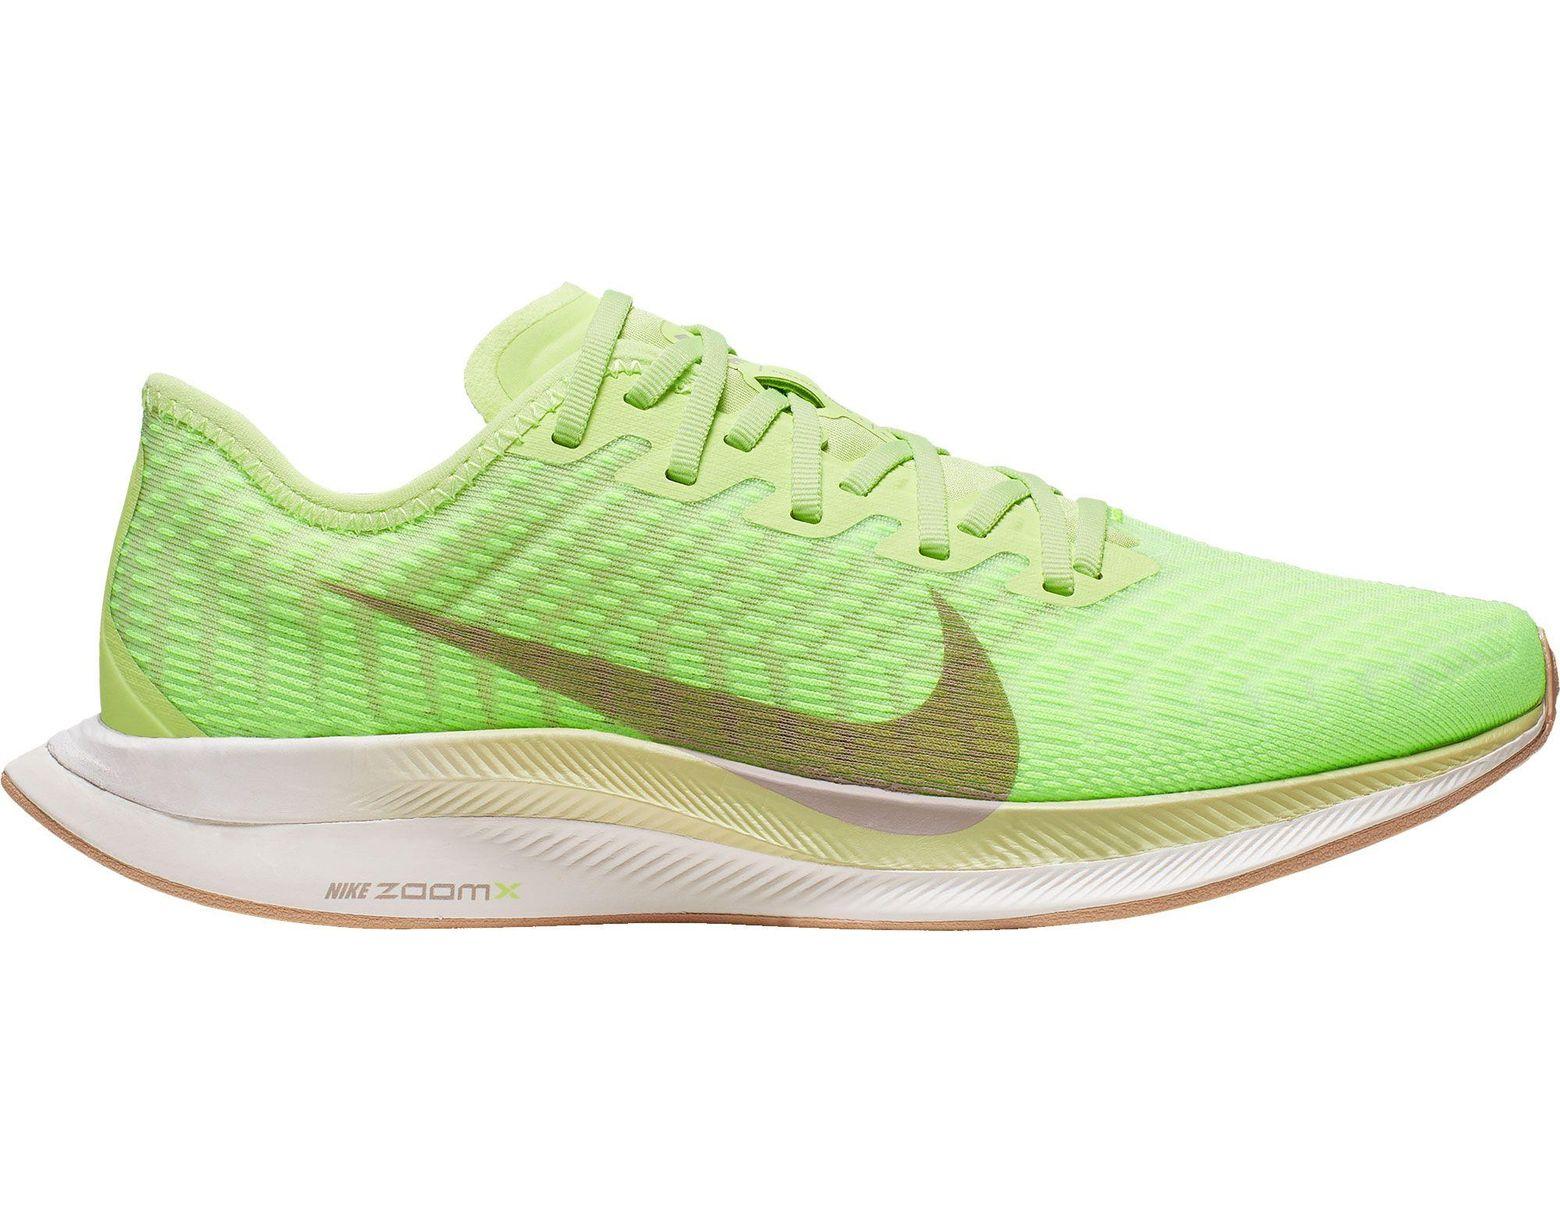 00d25518a Nike Zoom Pegasus Turbo 2 Running Shoe in Green - Lyst